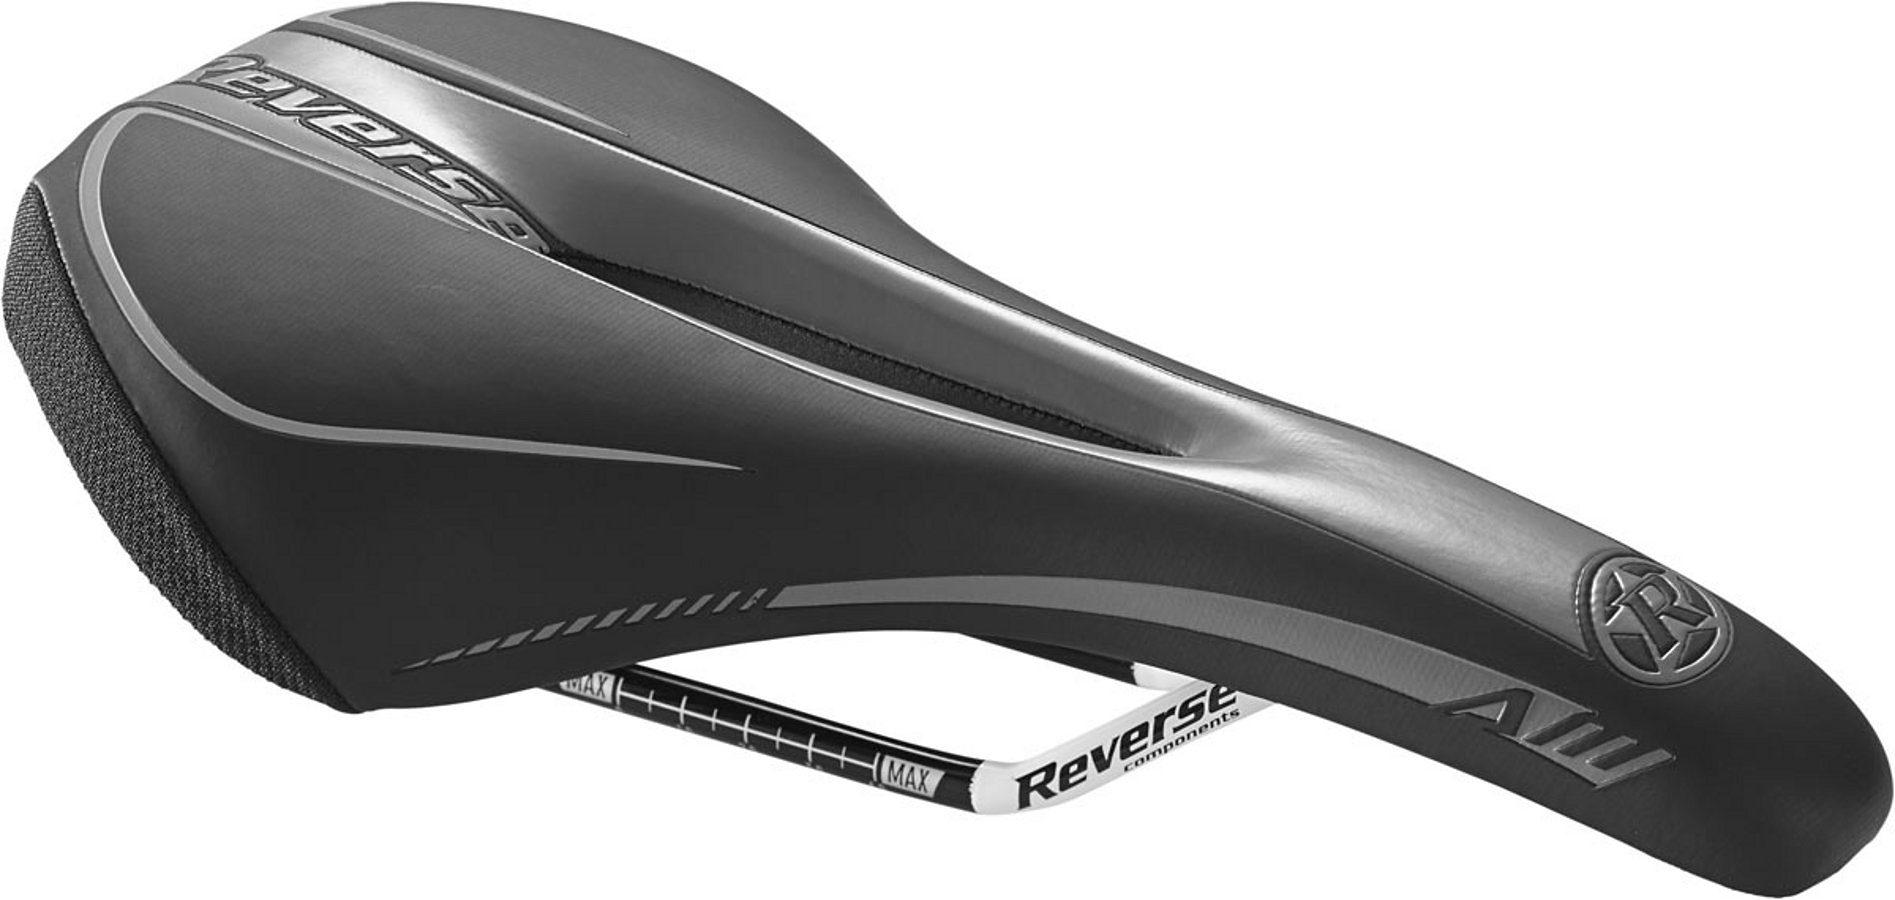 Reverse Fahrradsattel »AM-Ergo Saddle«